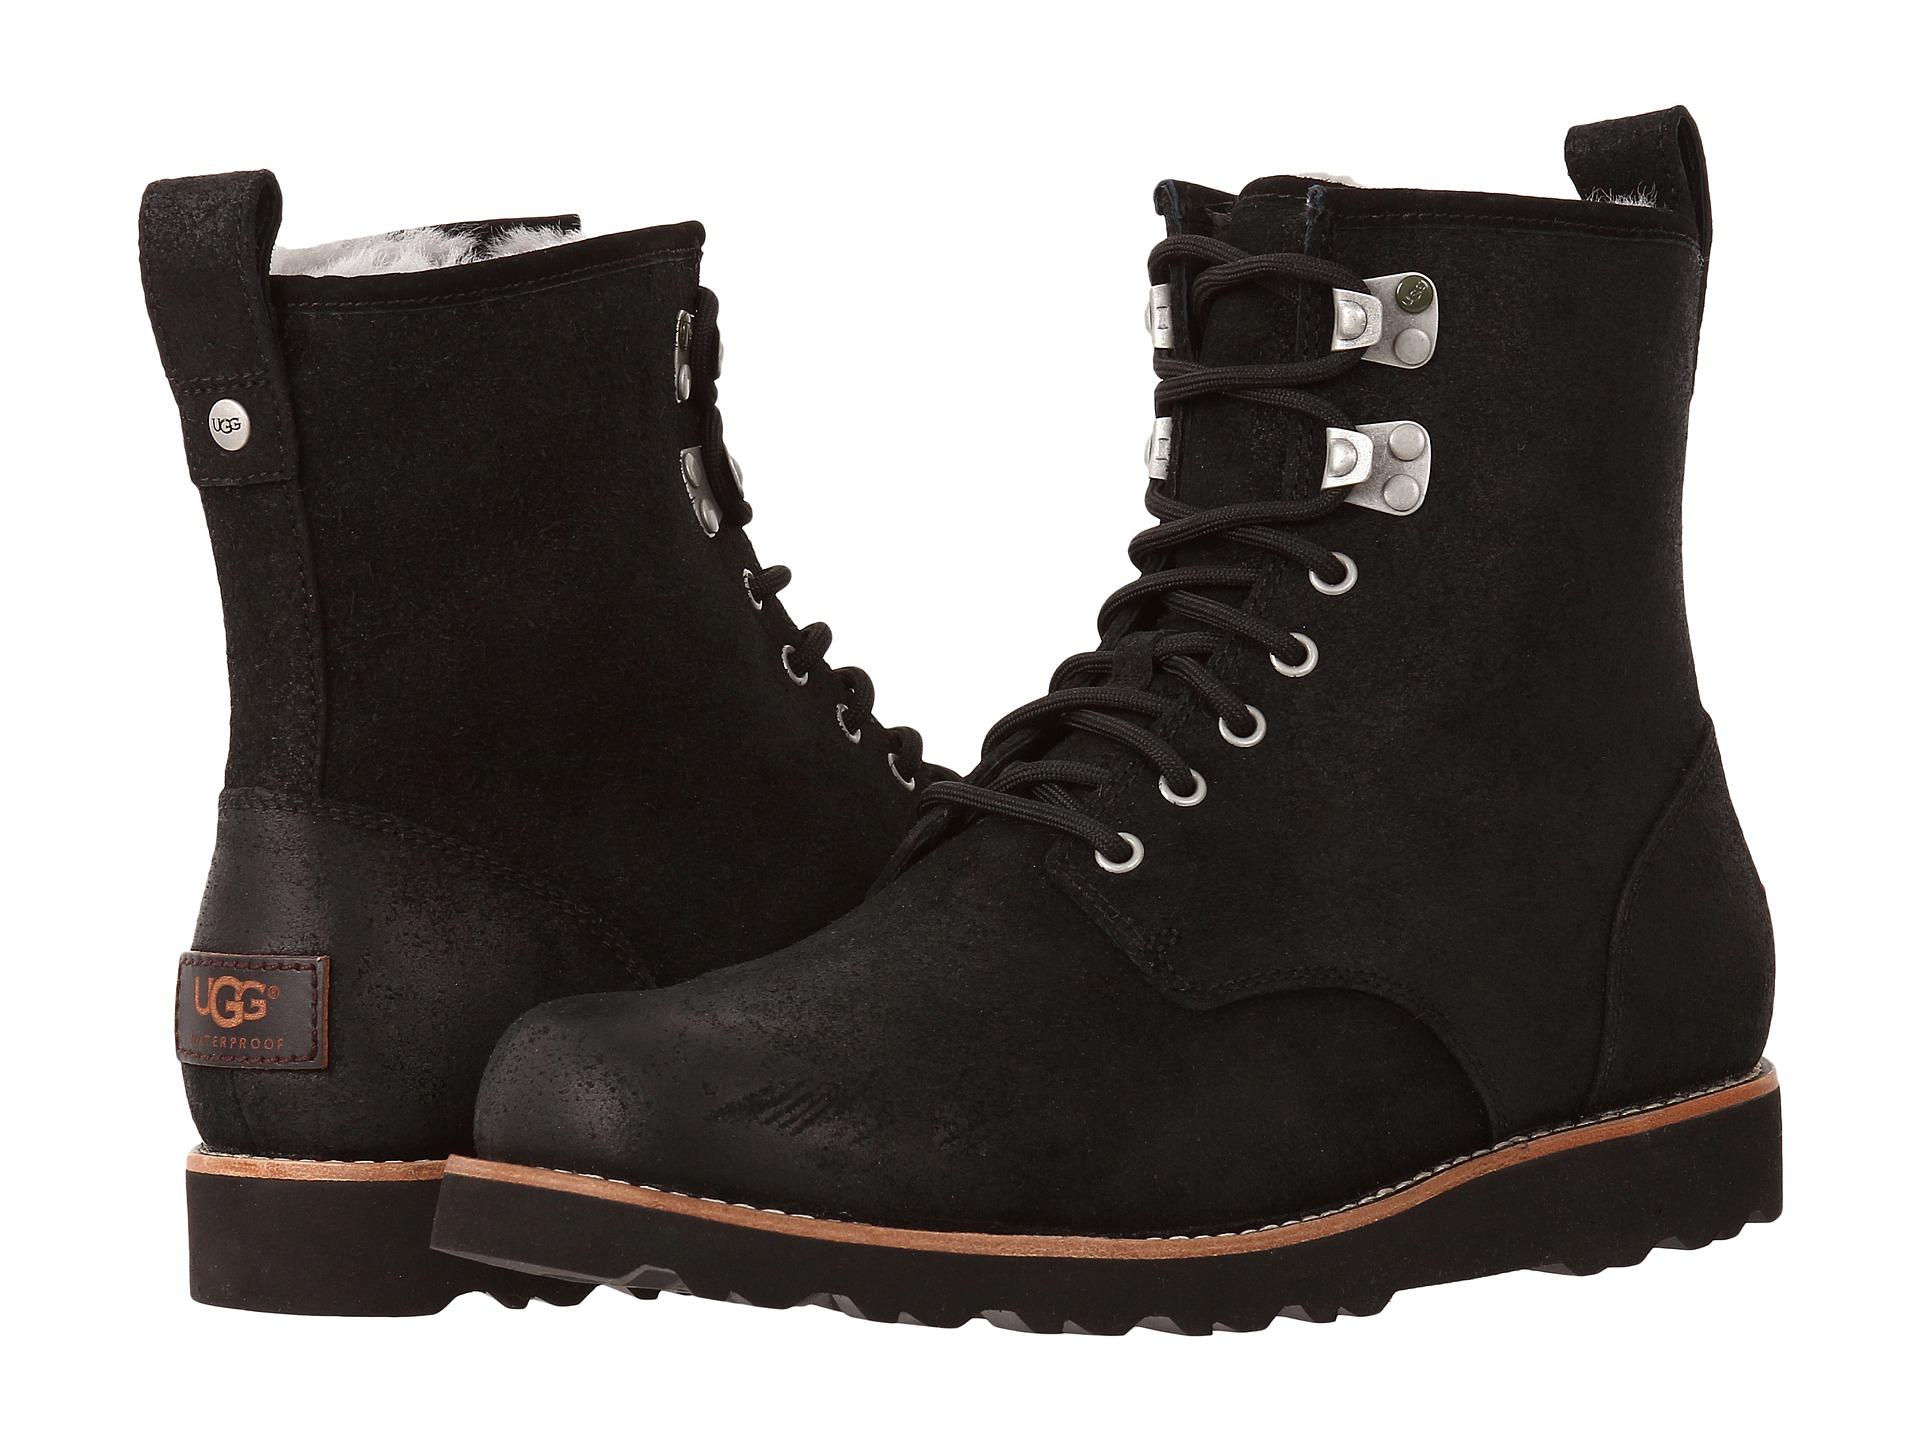 ugg hannen 3240 cordovan boots